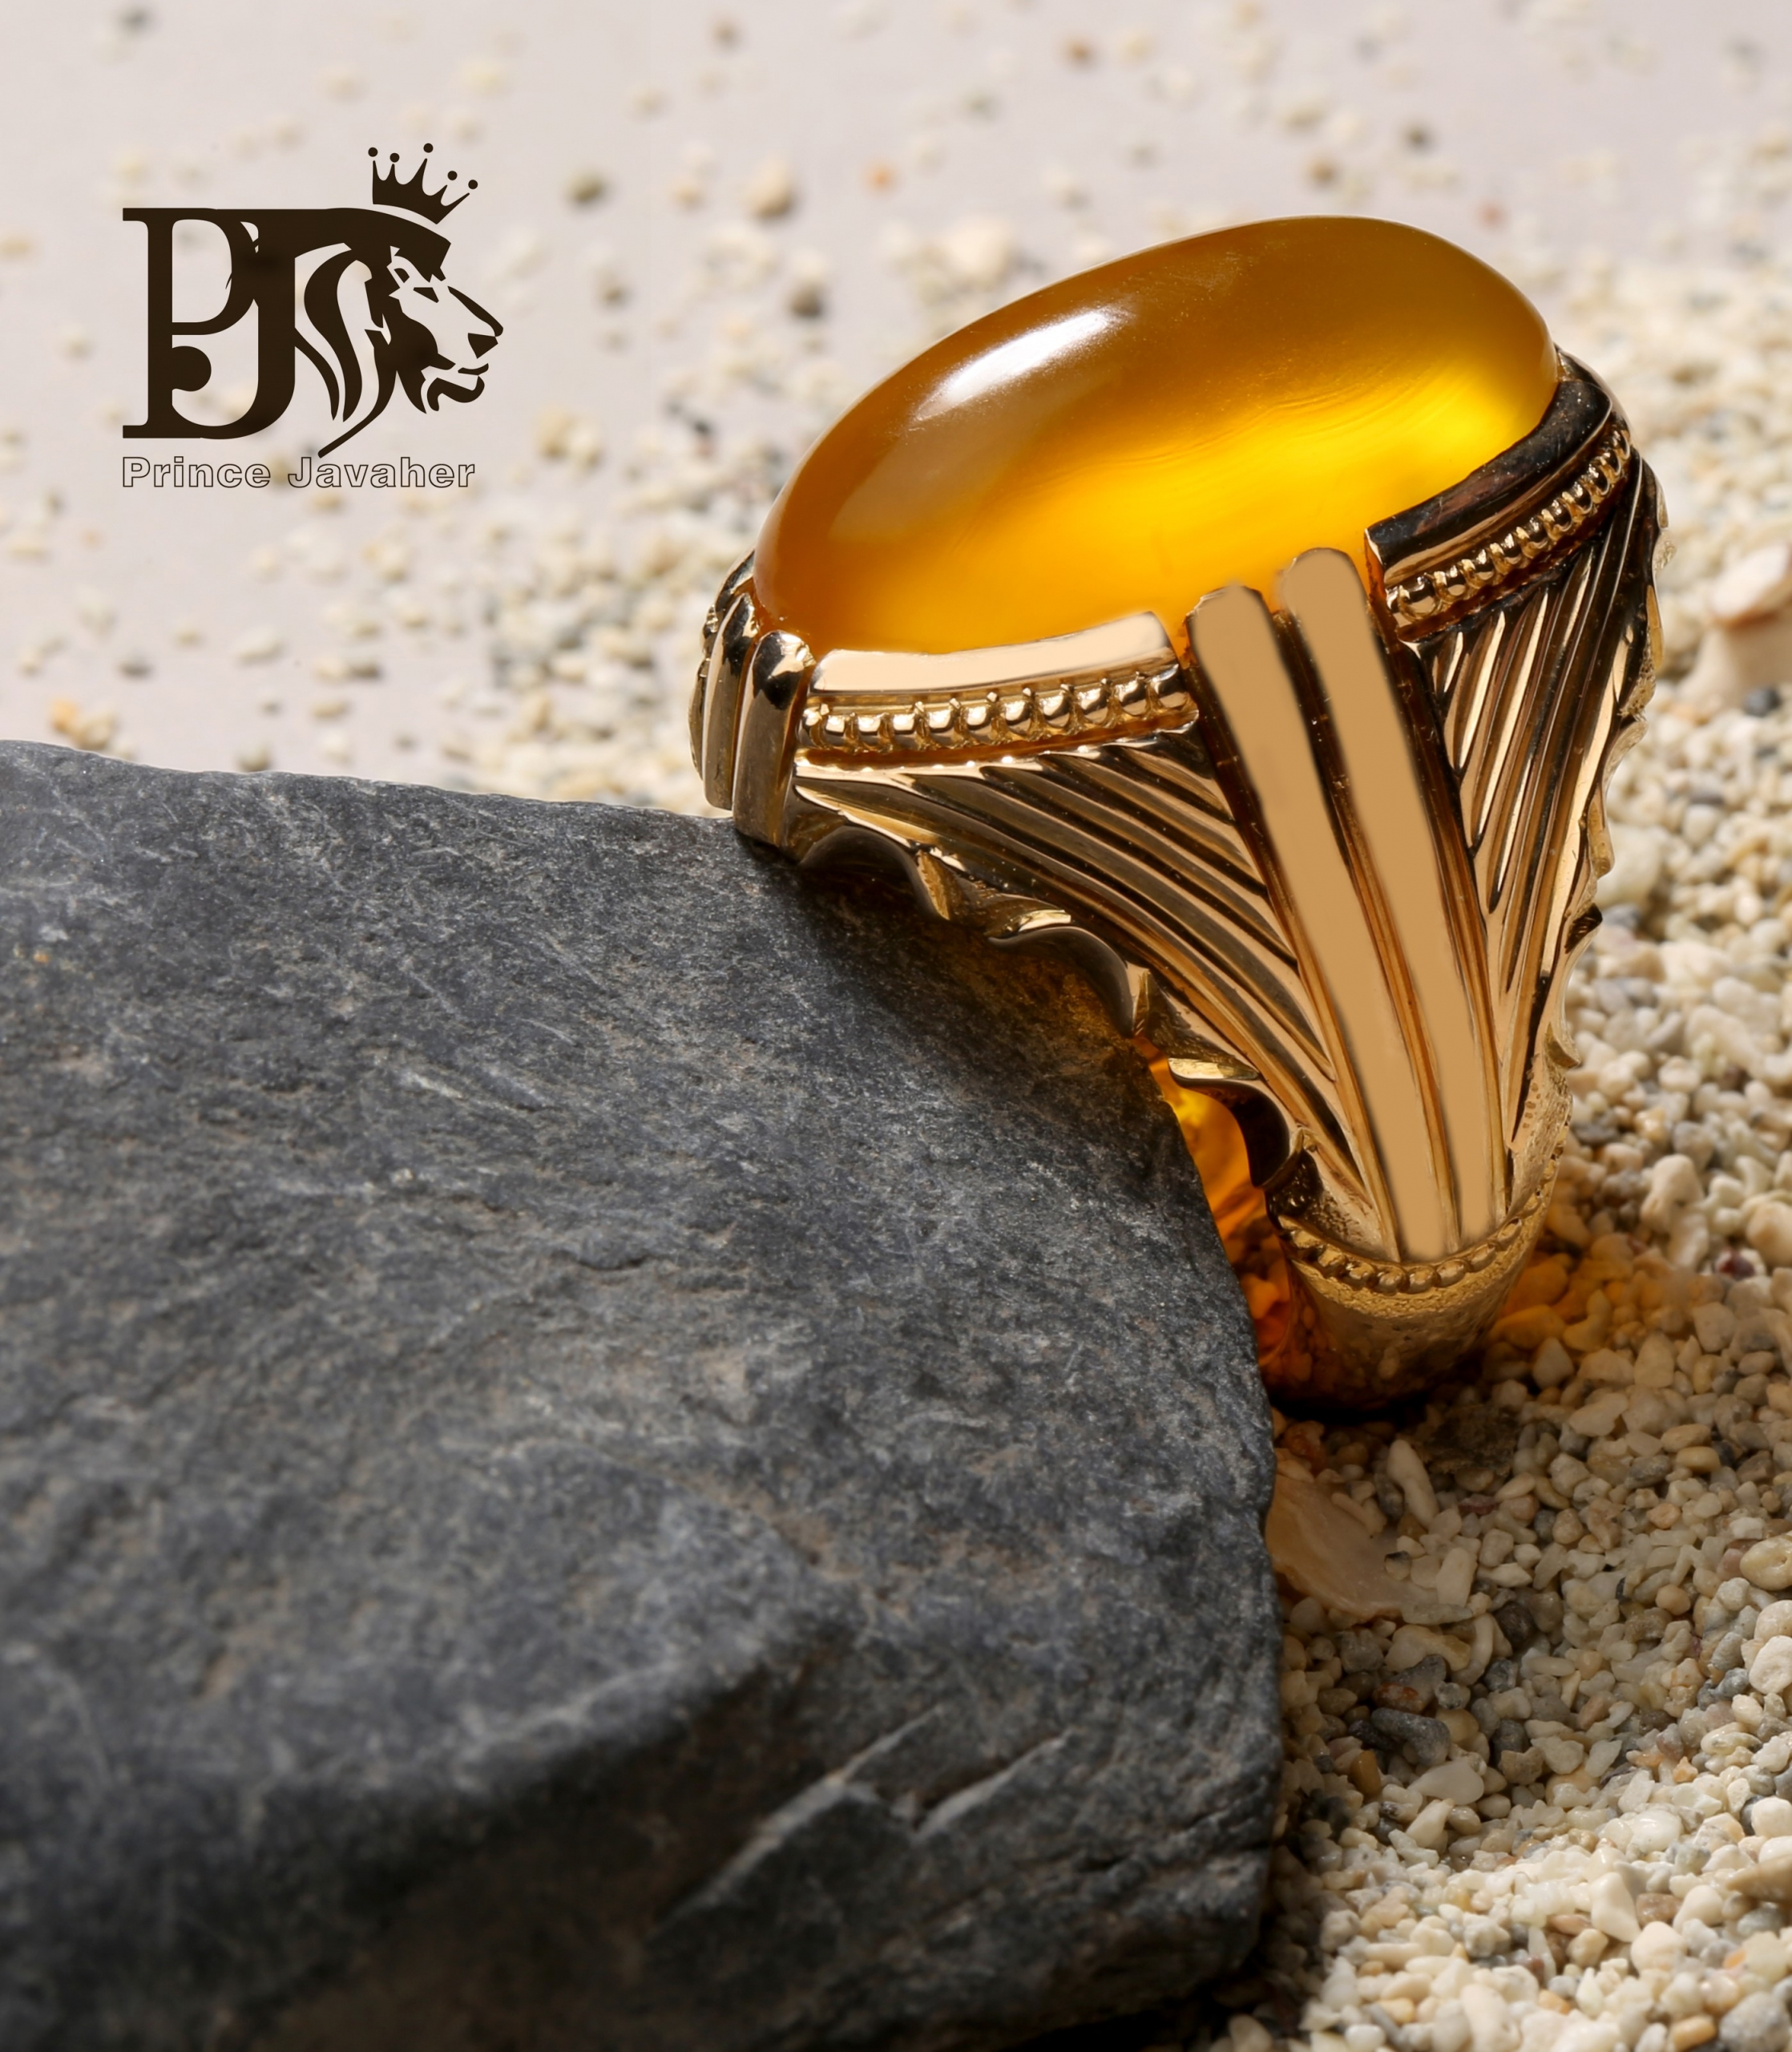 A-1418 انگشتر عقیق زرد یمنی کهنه با پایه تمام طلا